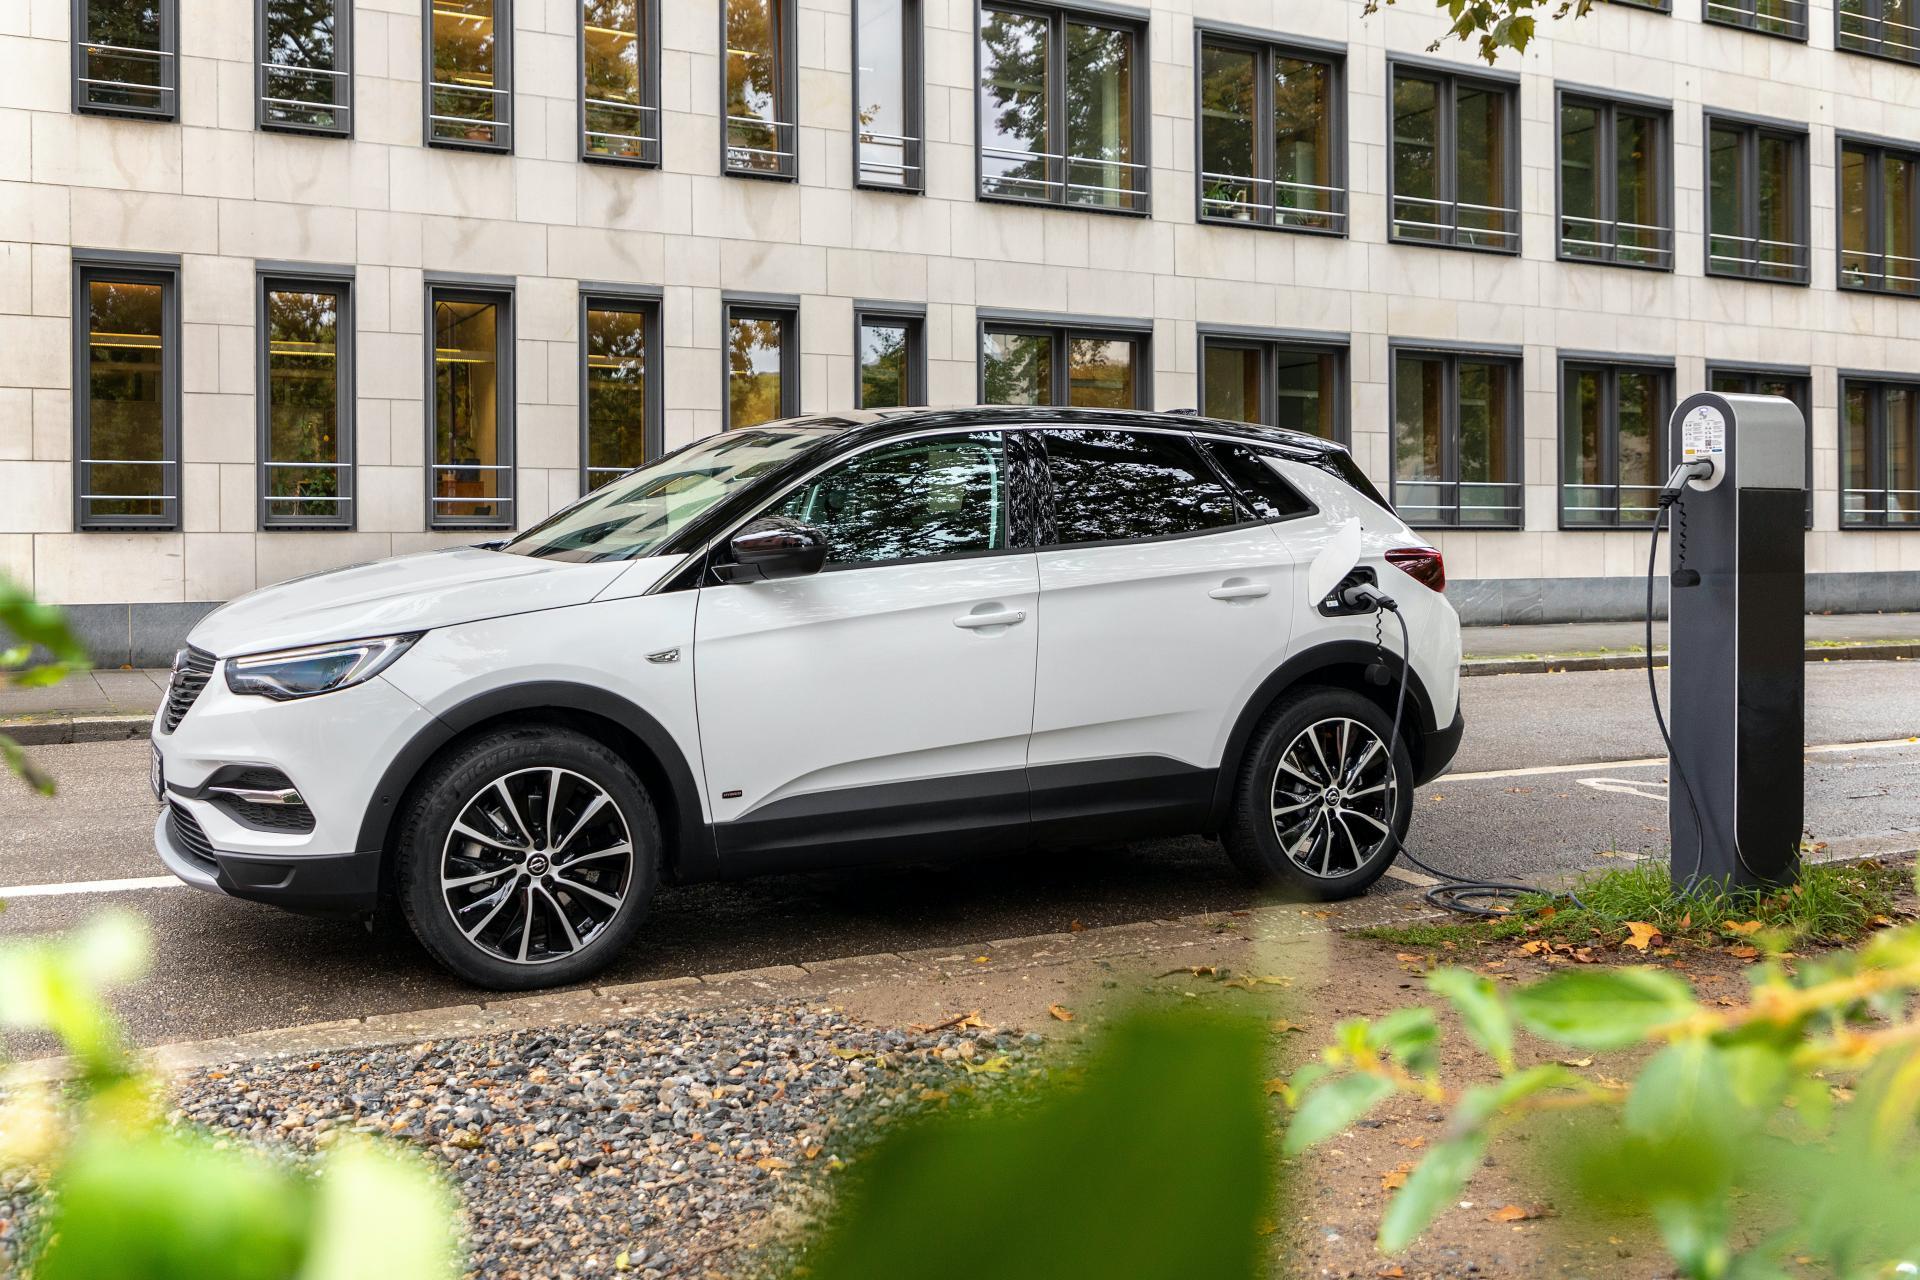 Opel-Grandland-X-PHEV-front-wheel-drive-5